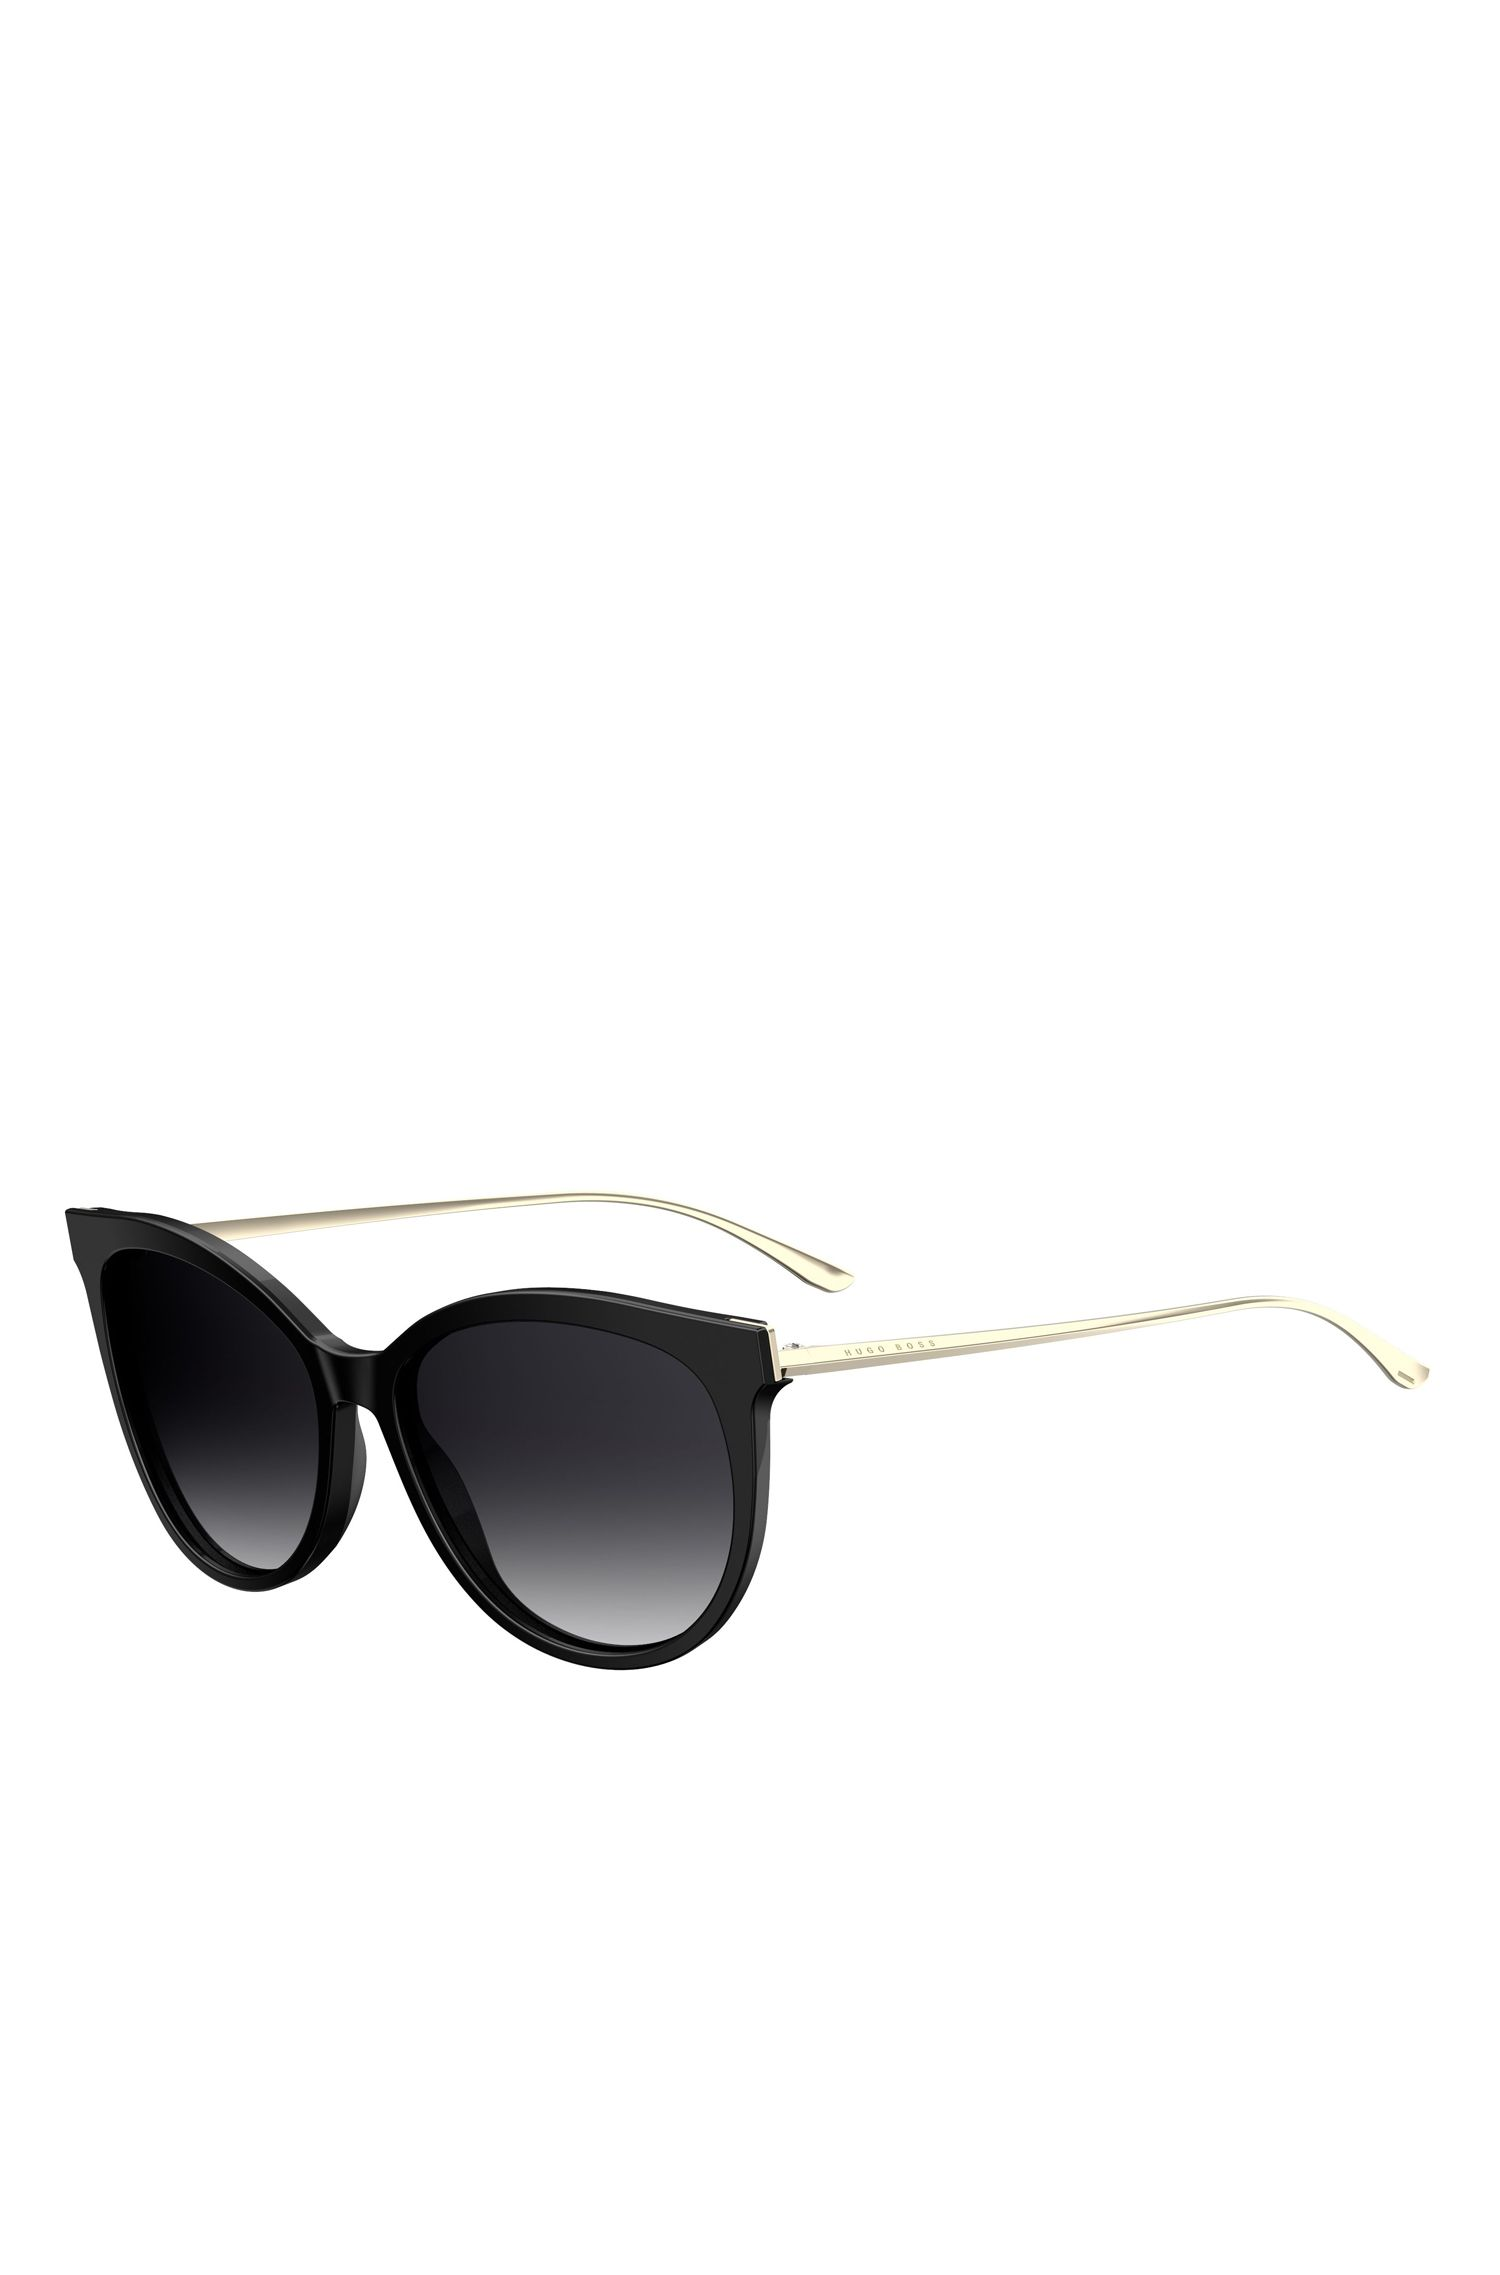 Black Cat-eye Sunglasses | BOSS 0892S, Assorted-Pre-Pack